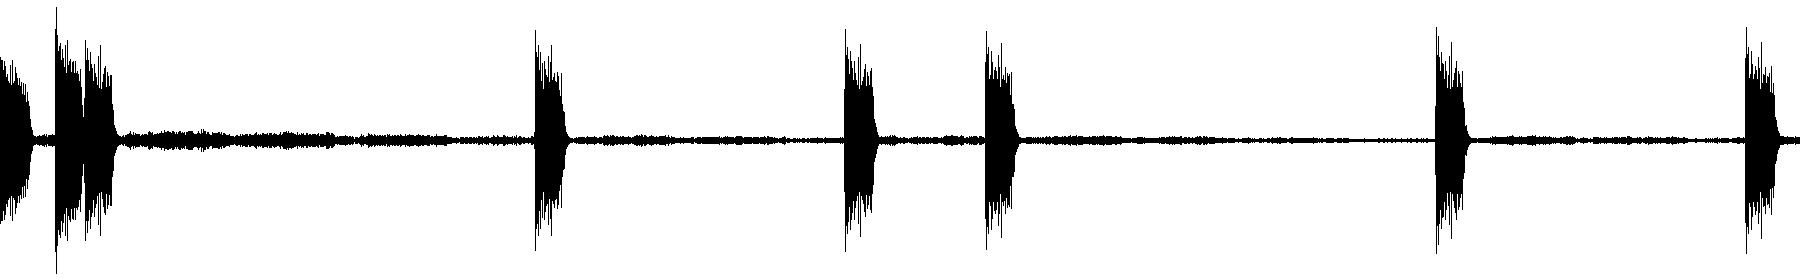 pth synth 09